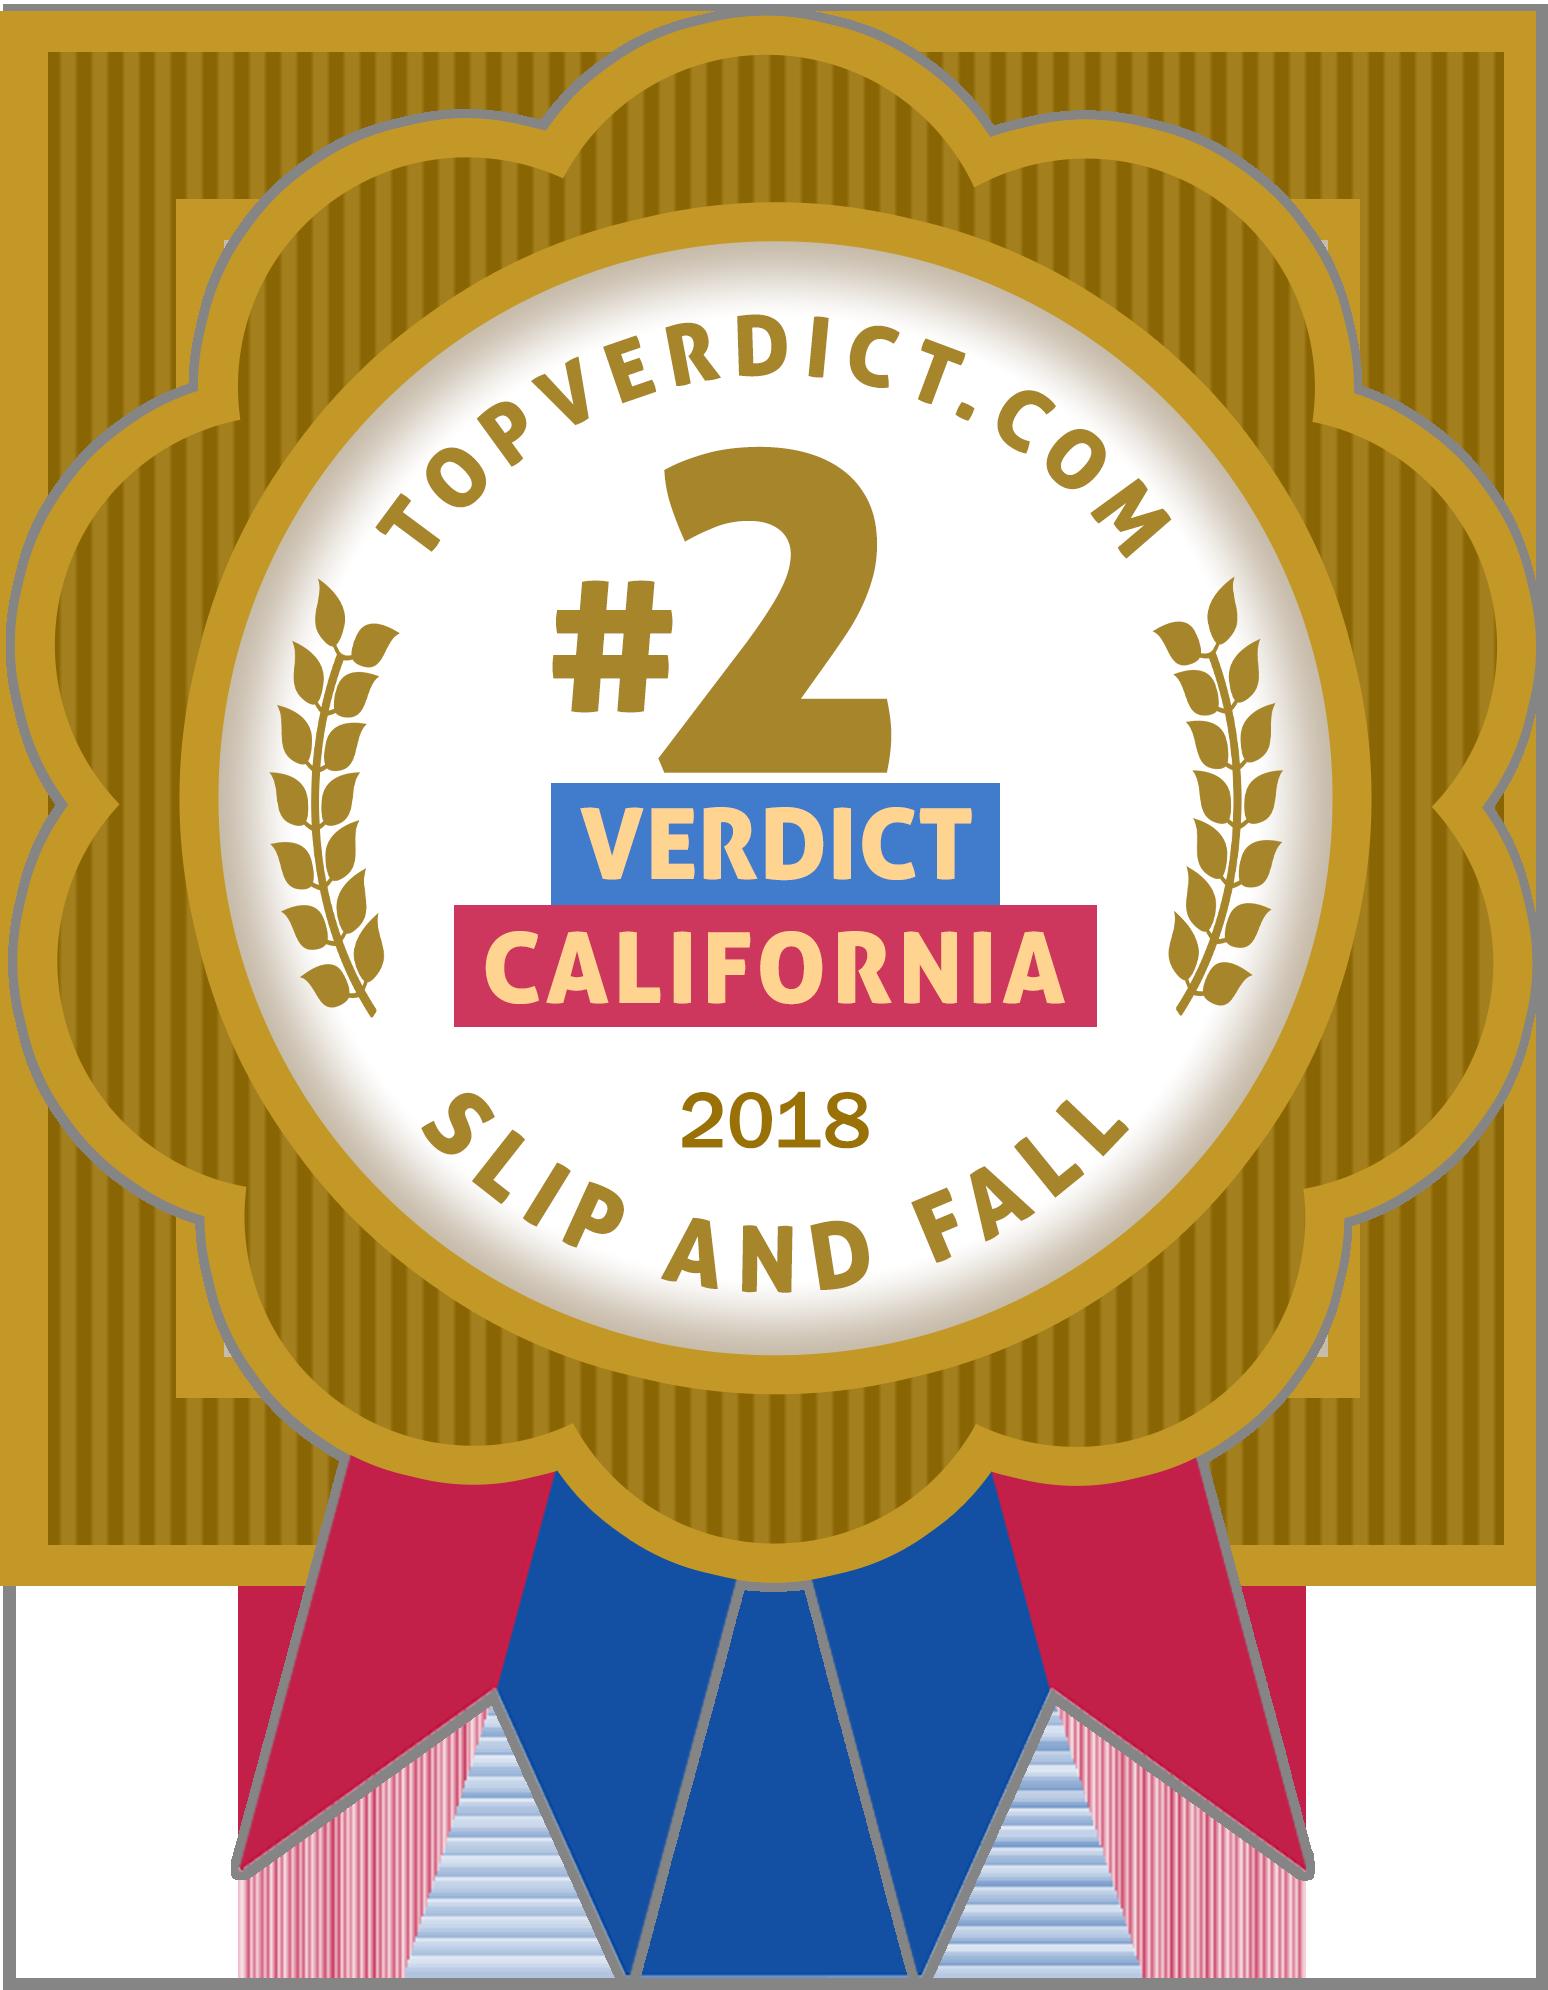 2018-no2-slip-and-fall-verdict-ca